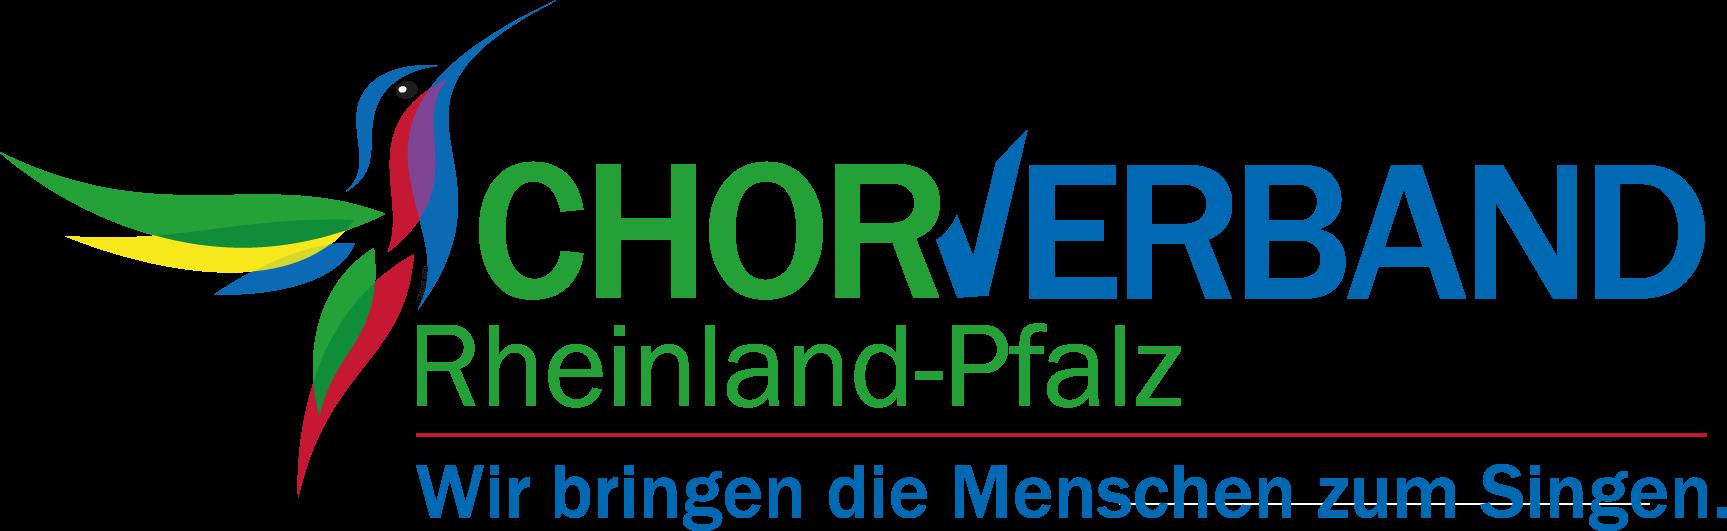 Mitglied im Chorverband Rheinland-Pfalz